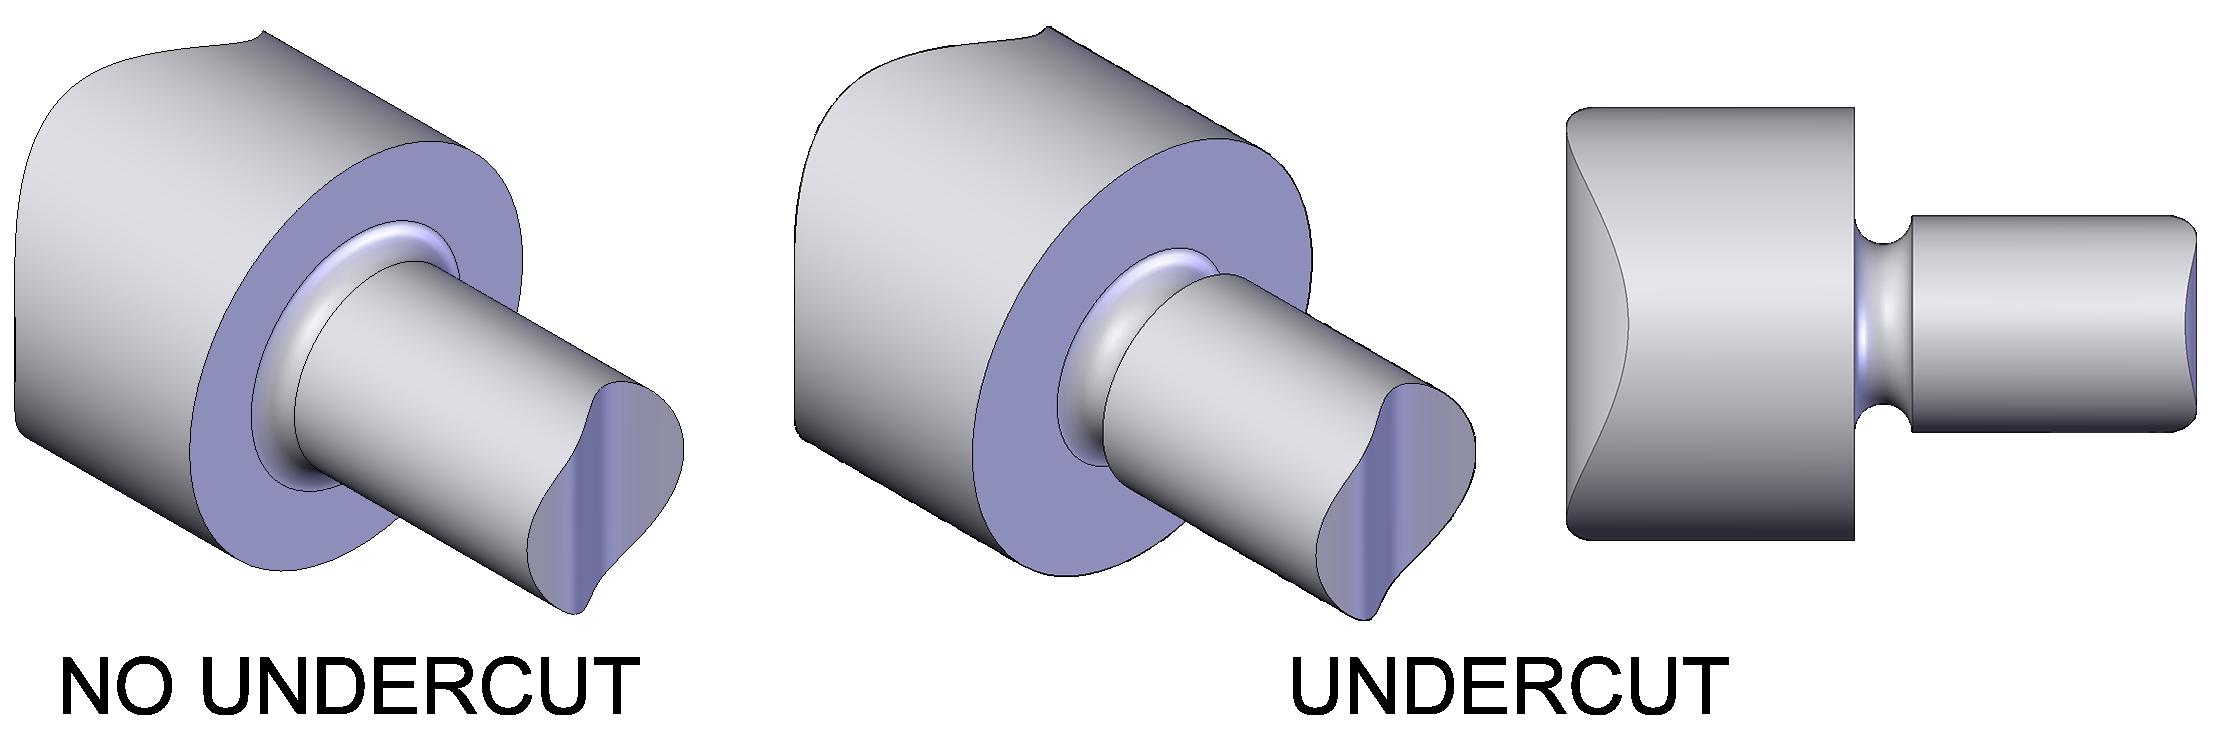 File:Undercut turning.png - Wikimedia Commons